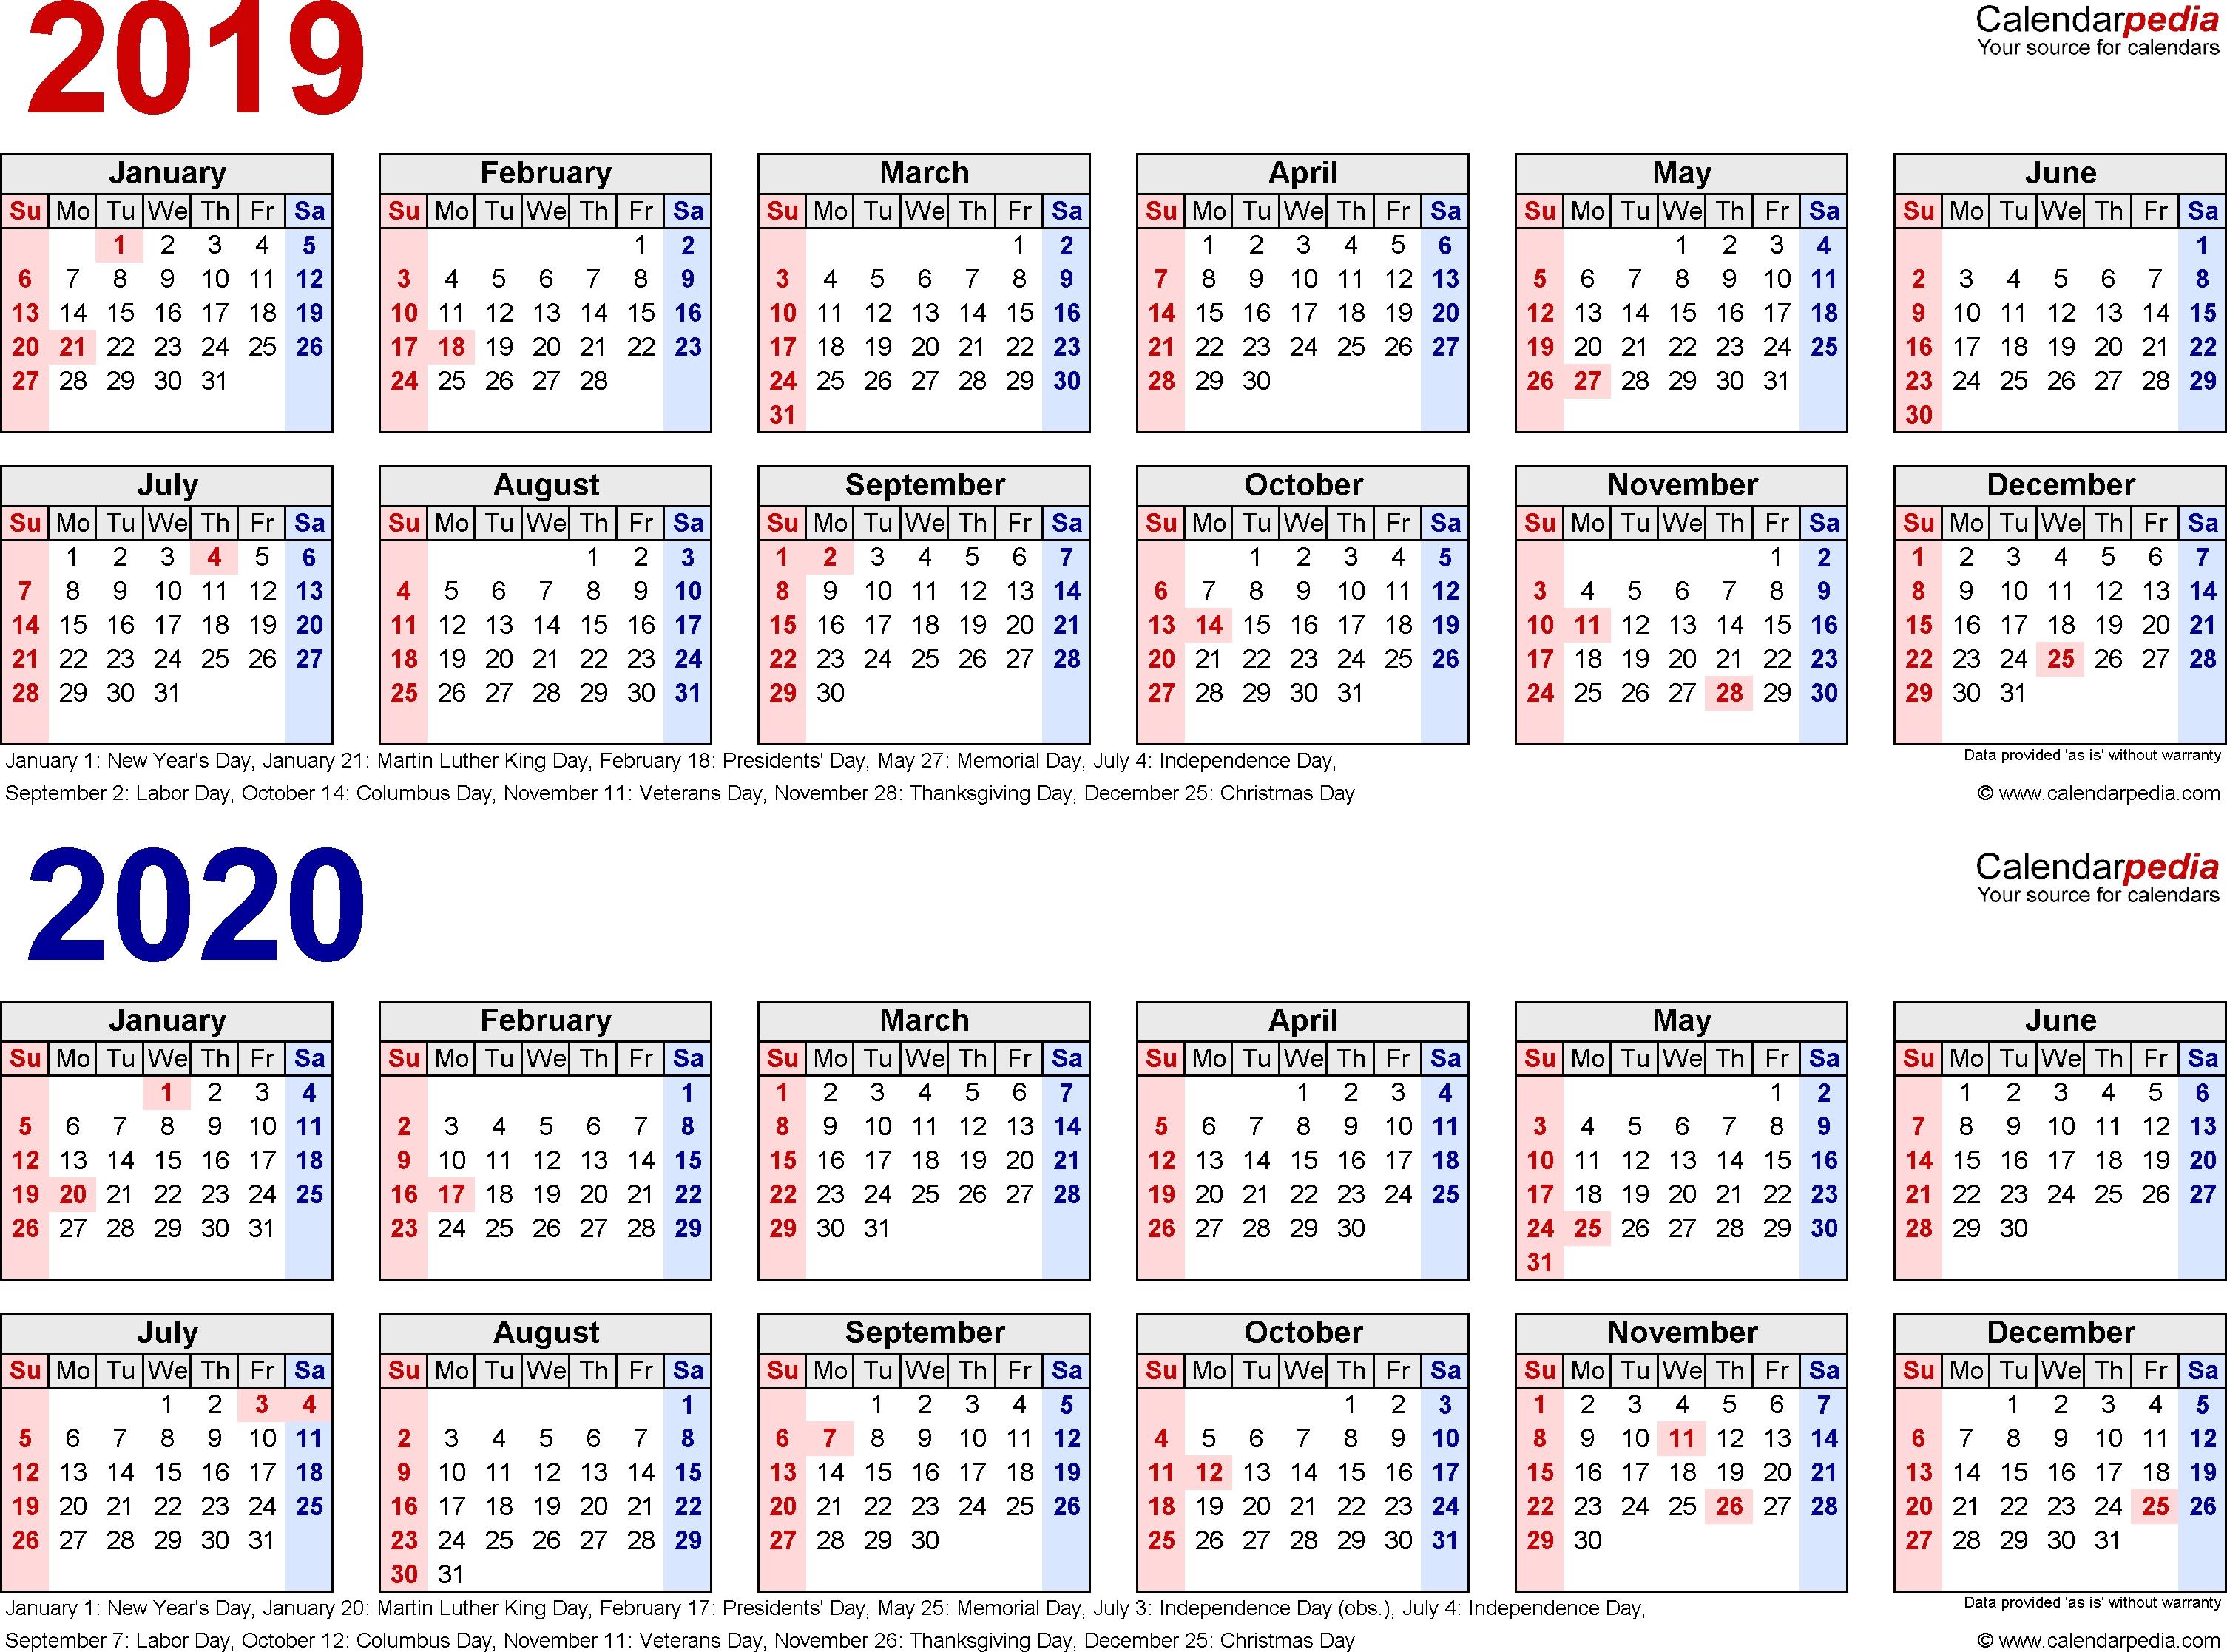 2019-2020 Calendar - Free Printable Two-Year Pdf Calendars with Free Printable Calendar 2019-2020